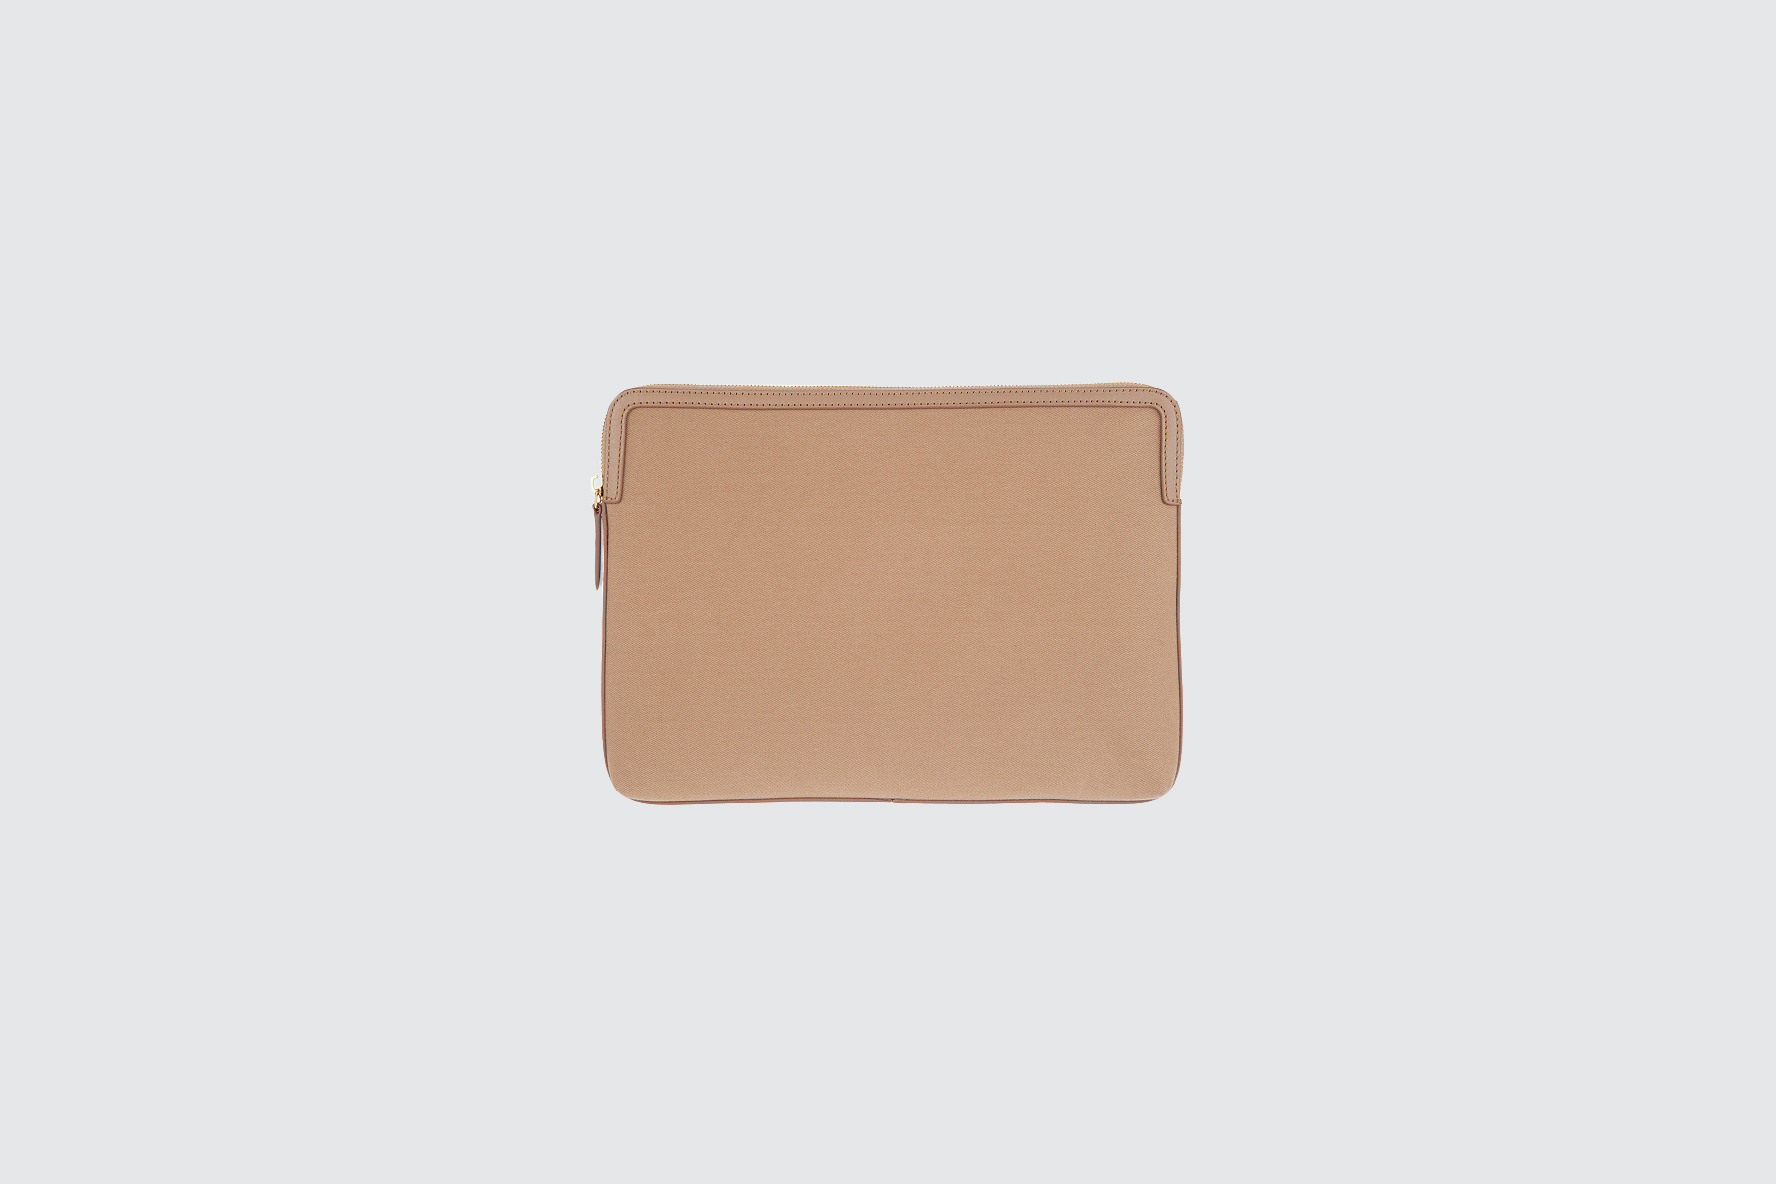 martha stewart large tan pouch